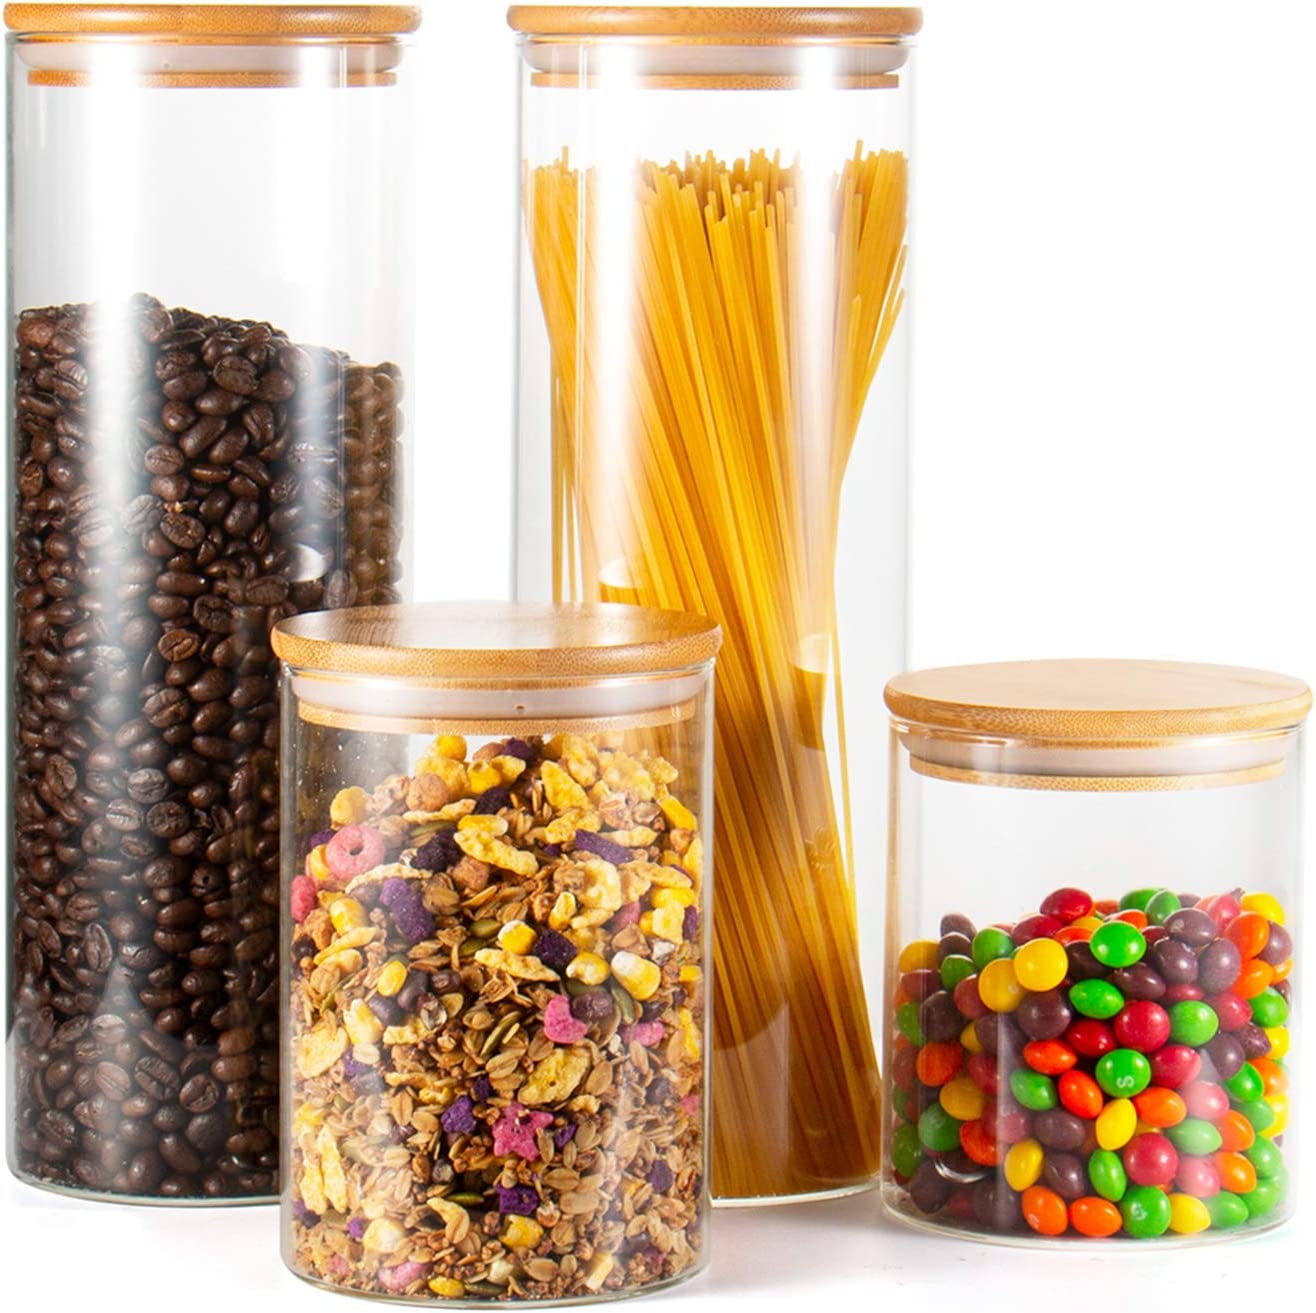 Glass Max 58% OFF Jar 4 years warranty with Lid Set of Jars Food Storage J TAOUNOA